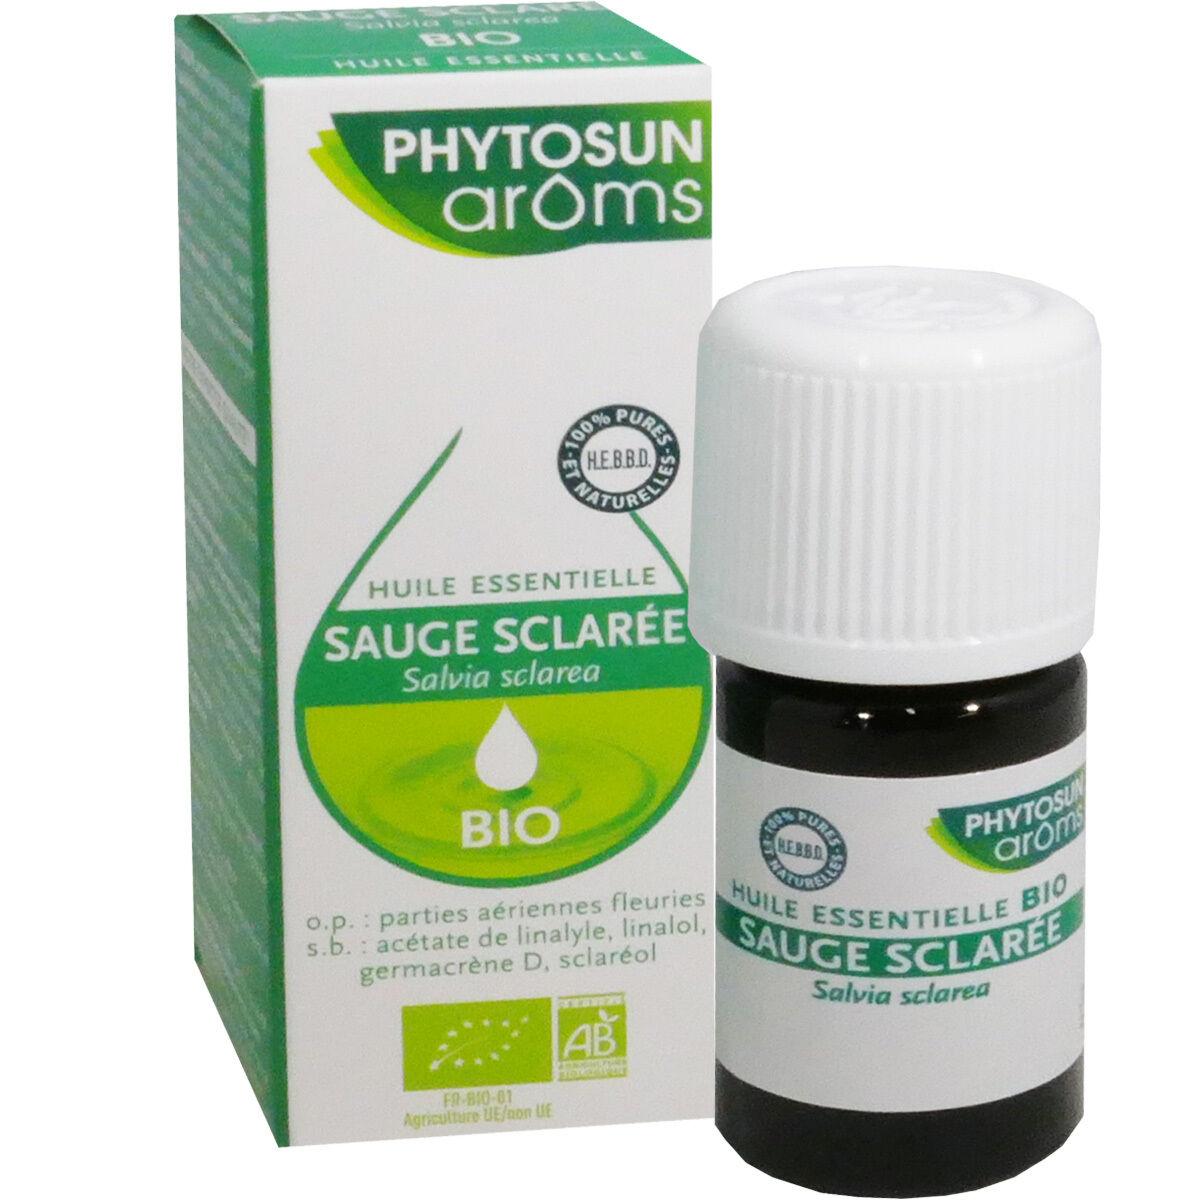 Phytosun aroms huile essentelle sauge sclaree bio 5ml